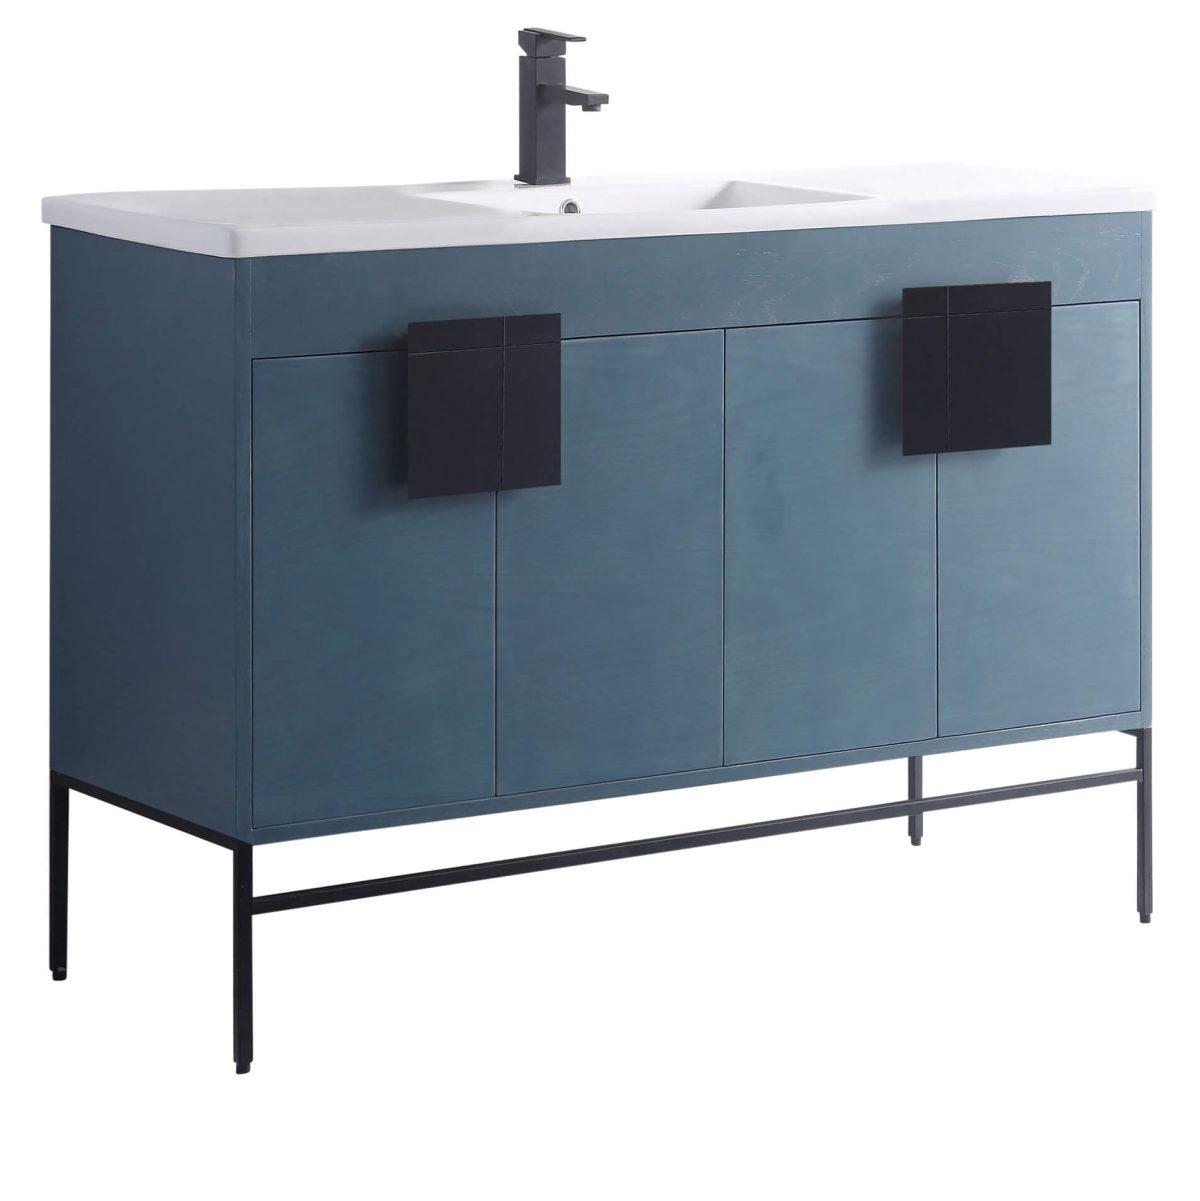 "Shawbridge 48"" Modern Single Bathroom Vanity  French Blue with Black Hardware"